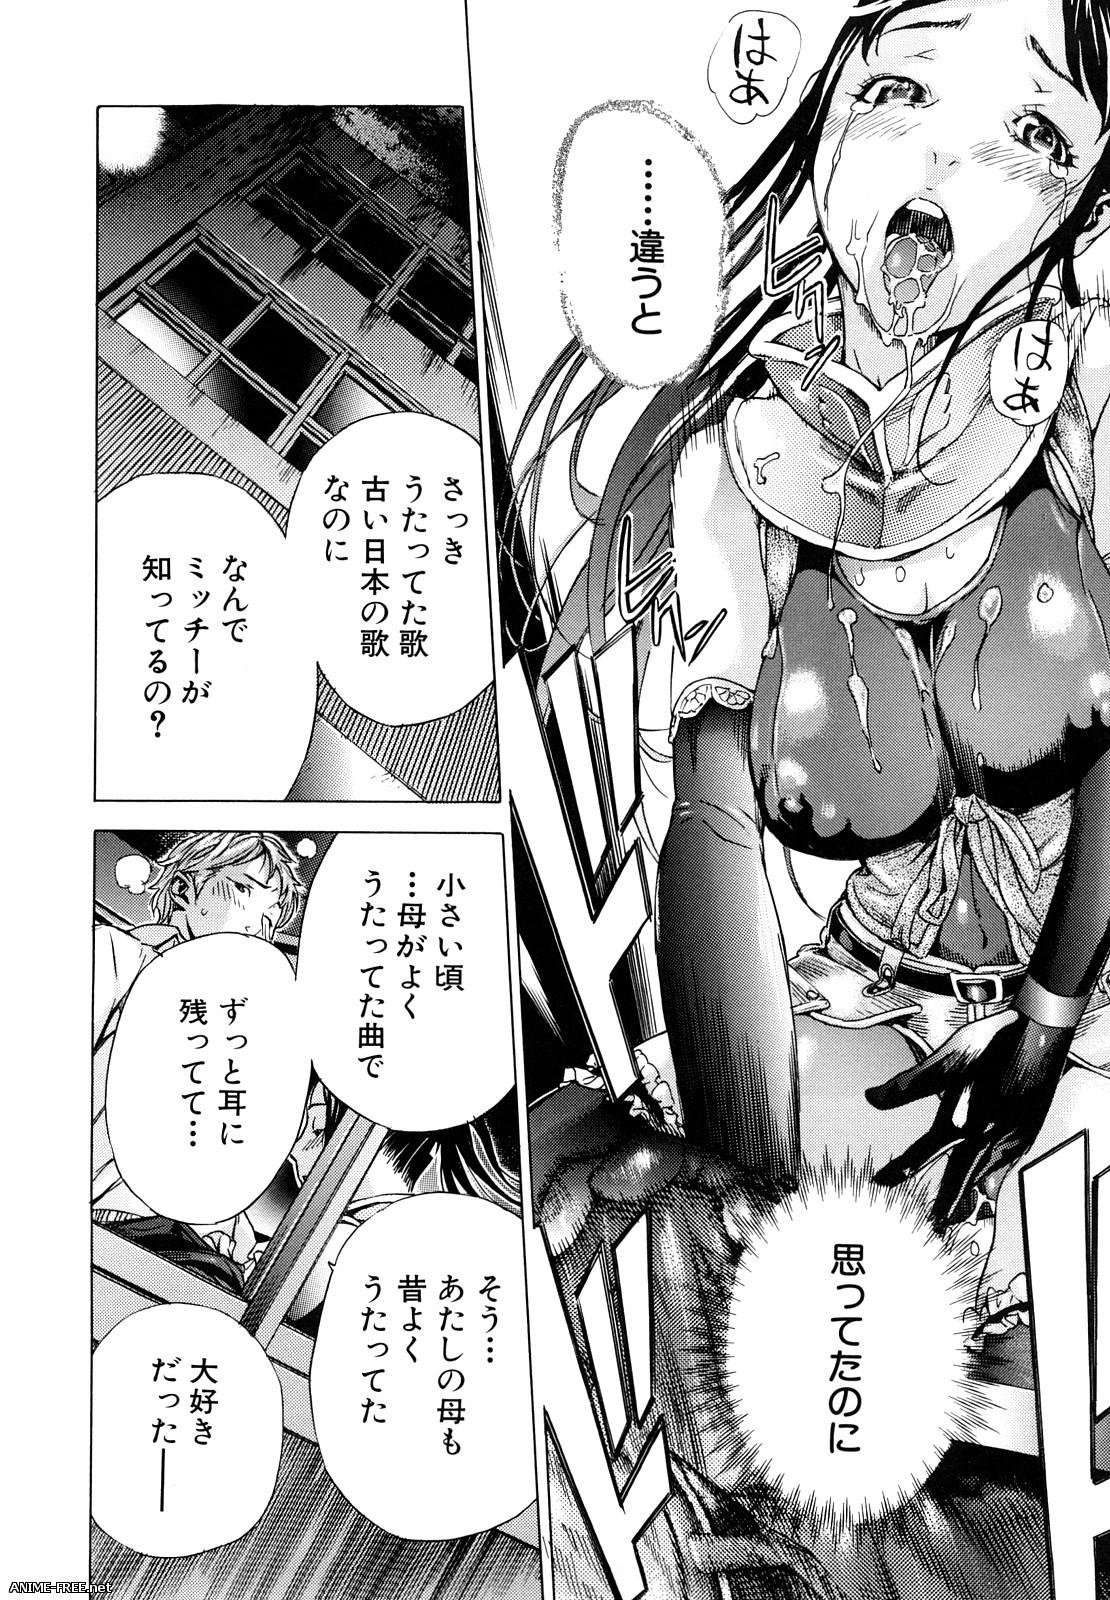 Sasagawa Hayashi - Сборник хентай манги [Ptcen] [ENG,RUS,JAP] Manga Hentai